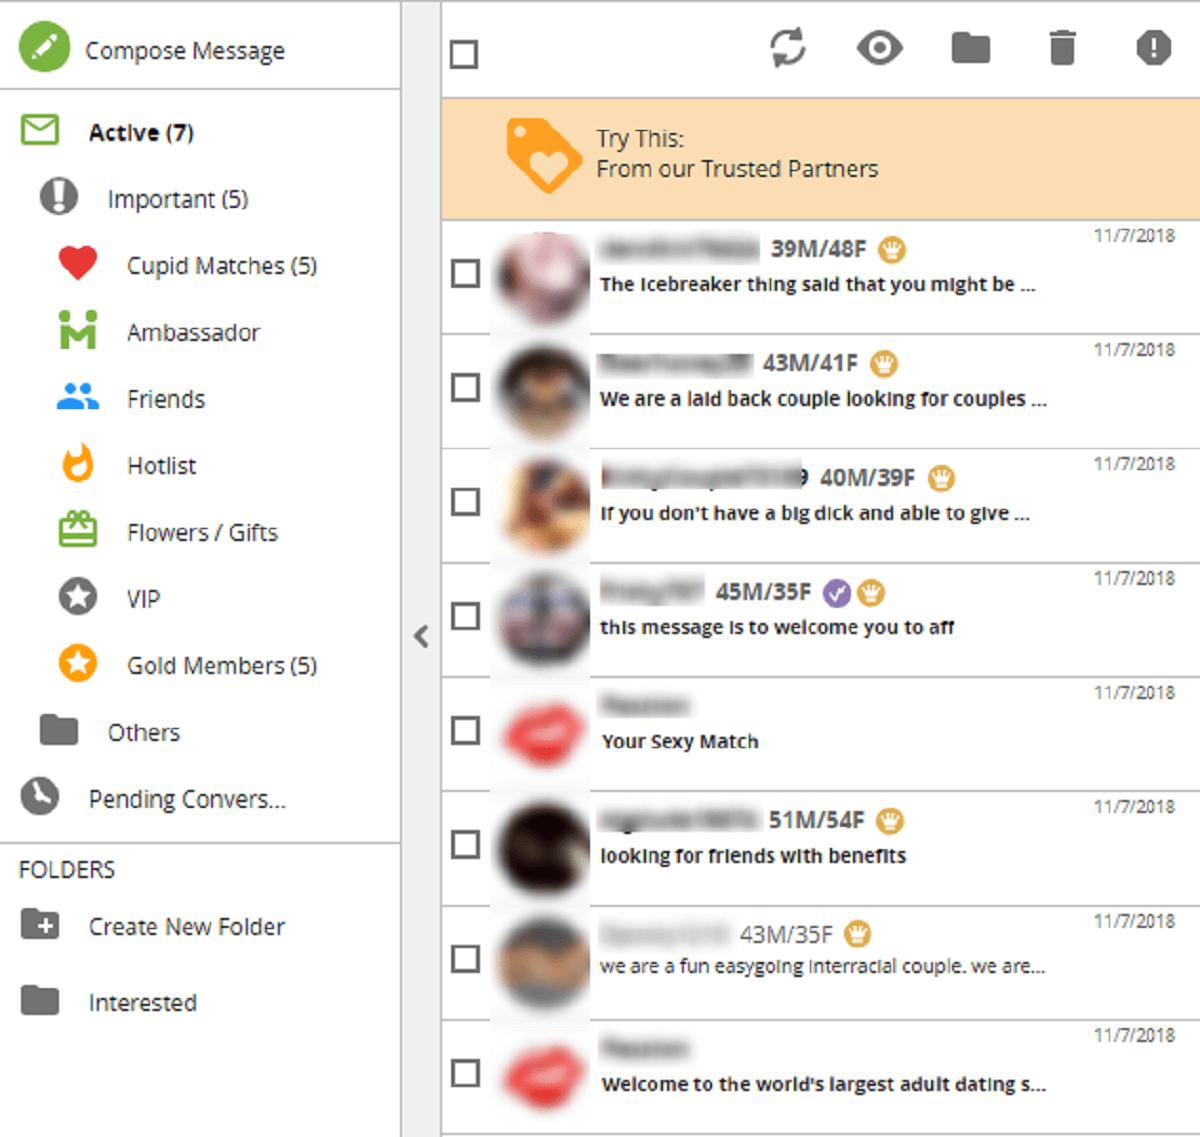 Passion.com Messaging